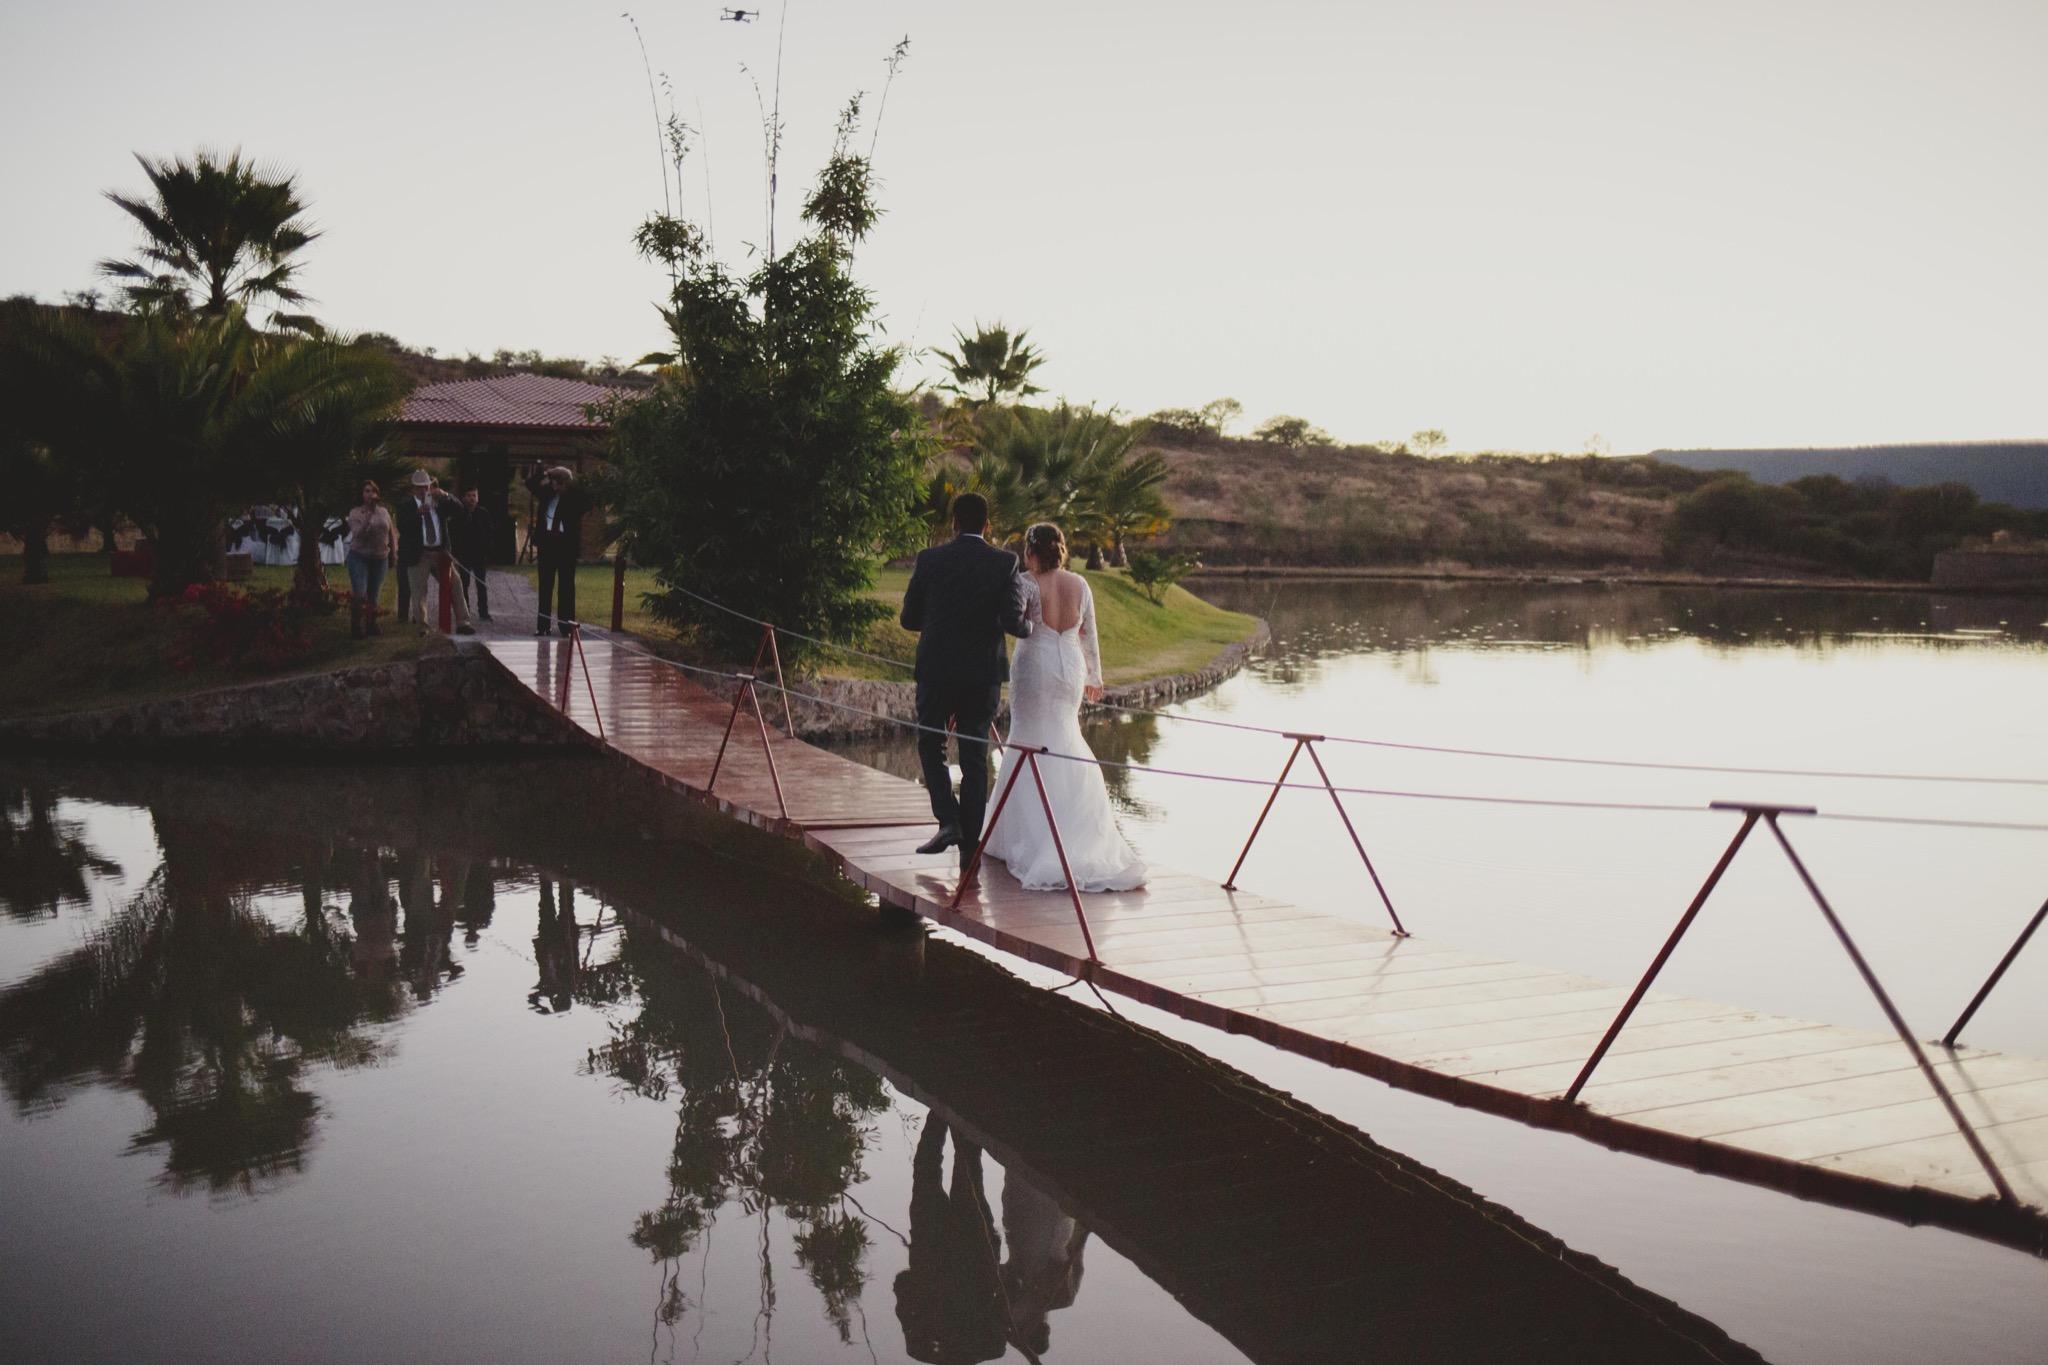 javier_noriega_fotografo_profesional_bodas_zacatecas_mexico_chihuahua_photographer_20